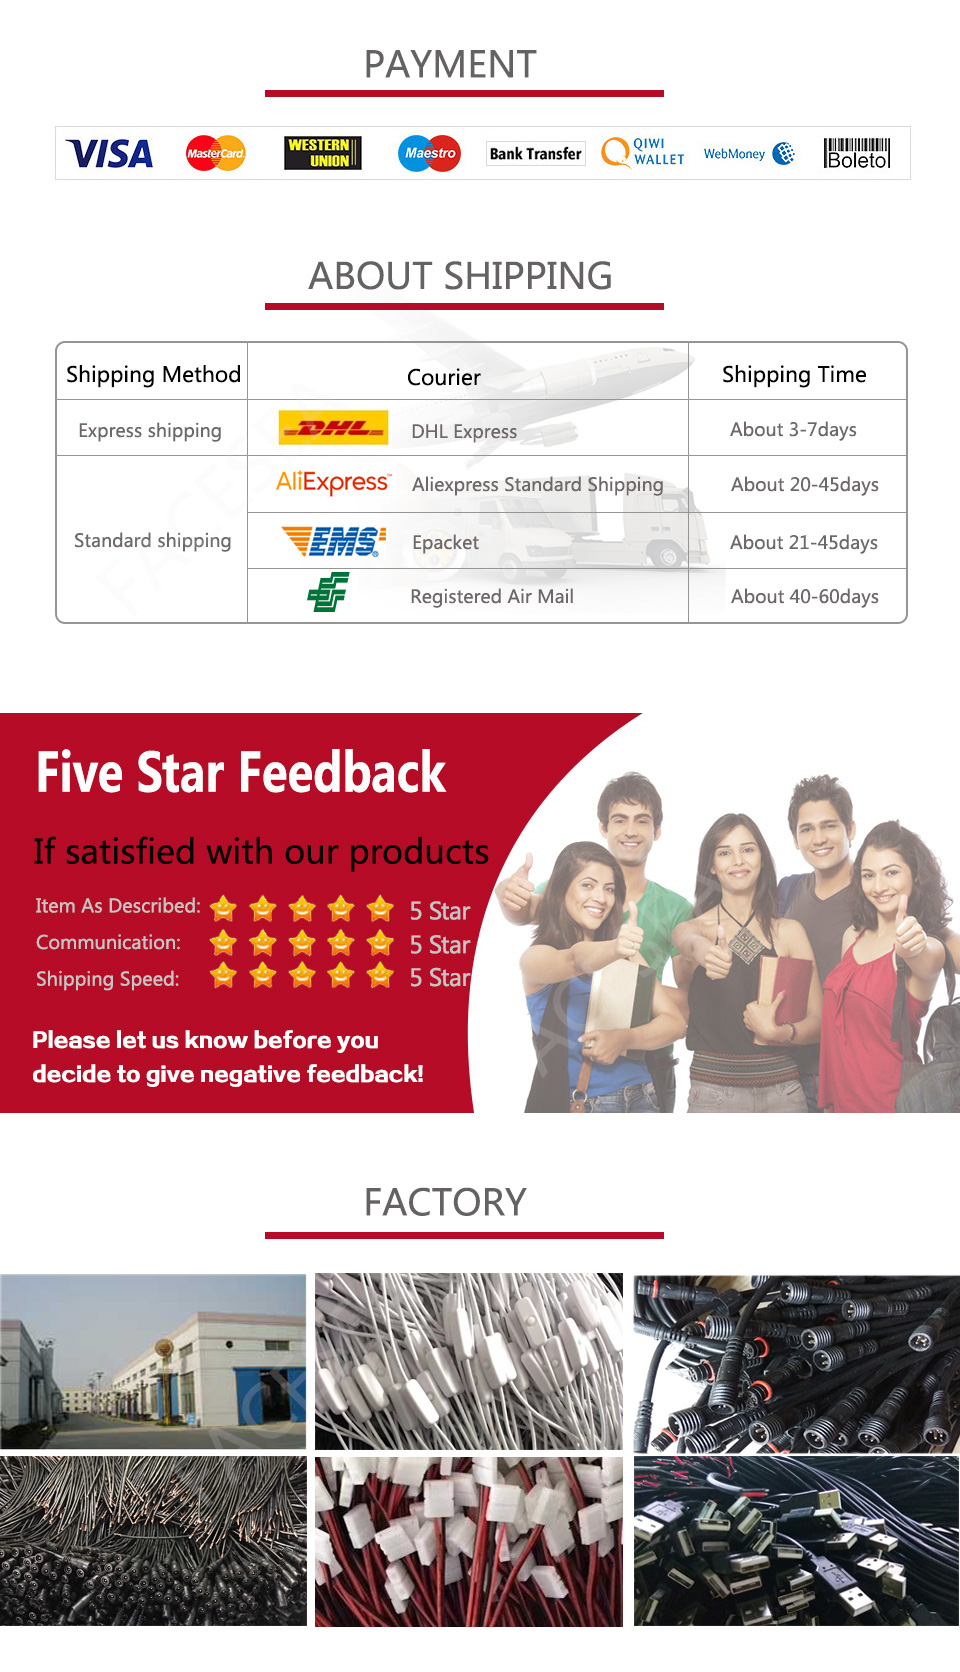 five-star-feedback-factory